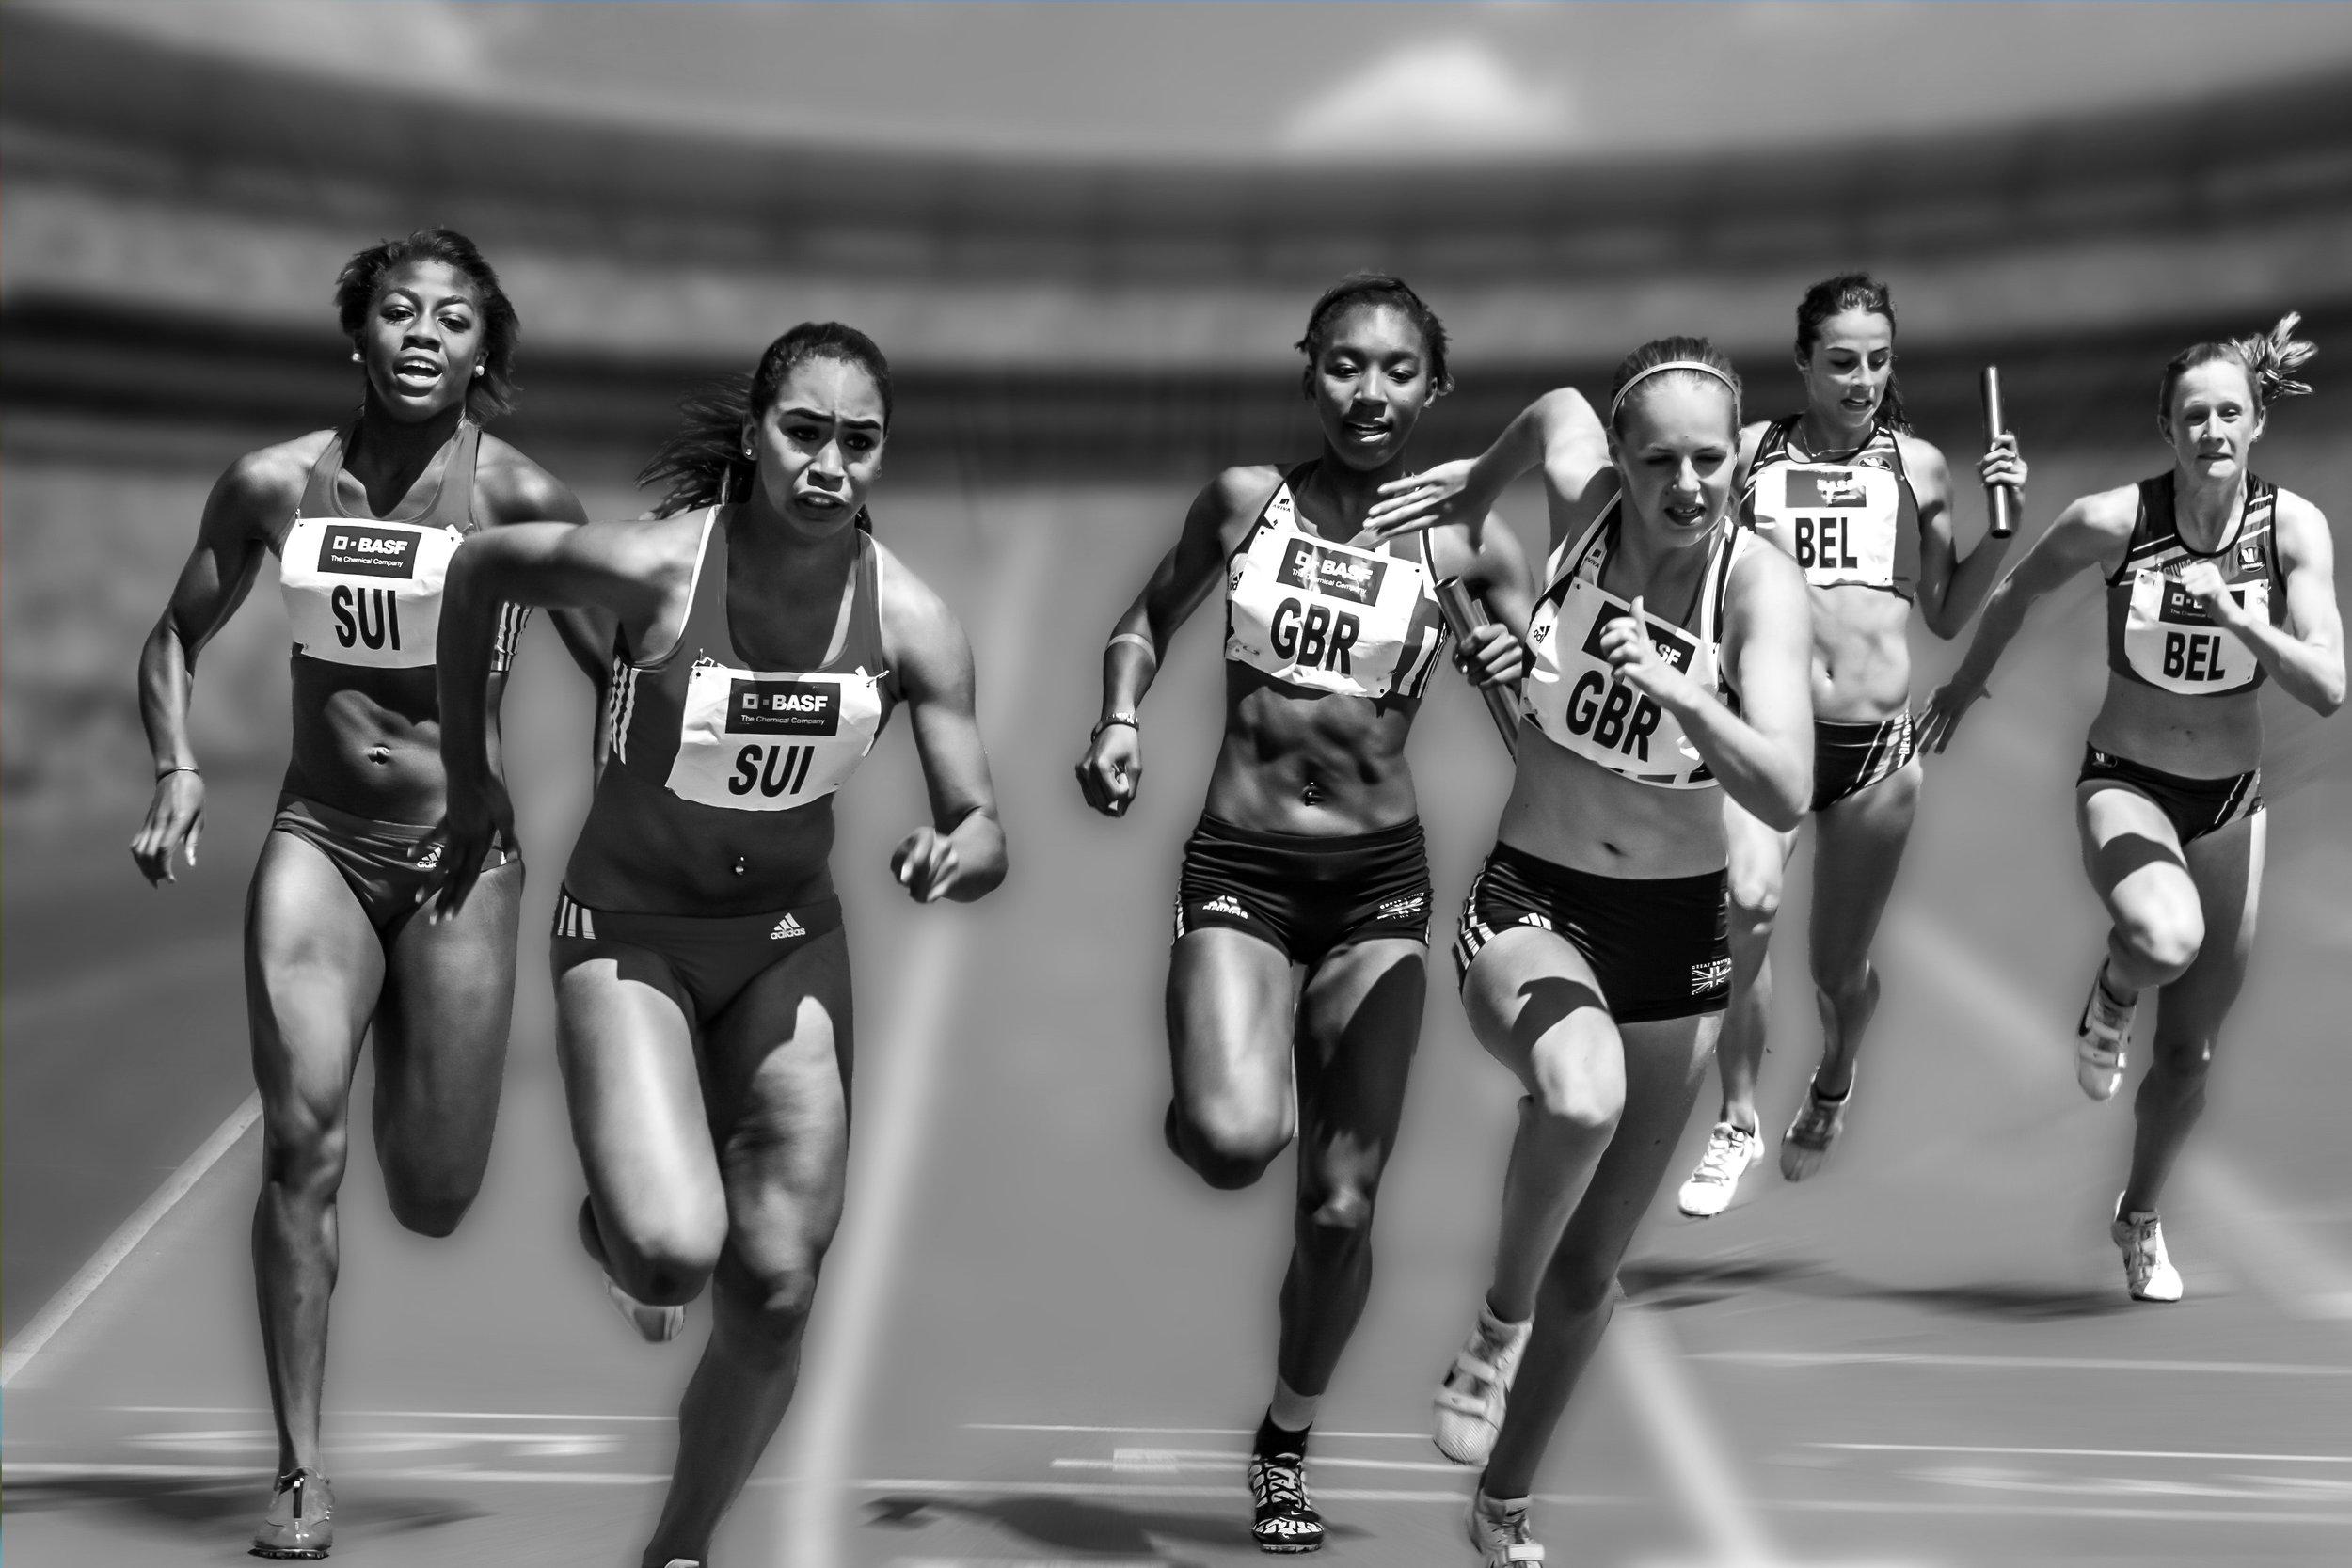 athletes-athletics-black-and-white-33703.jpg